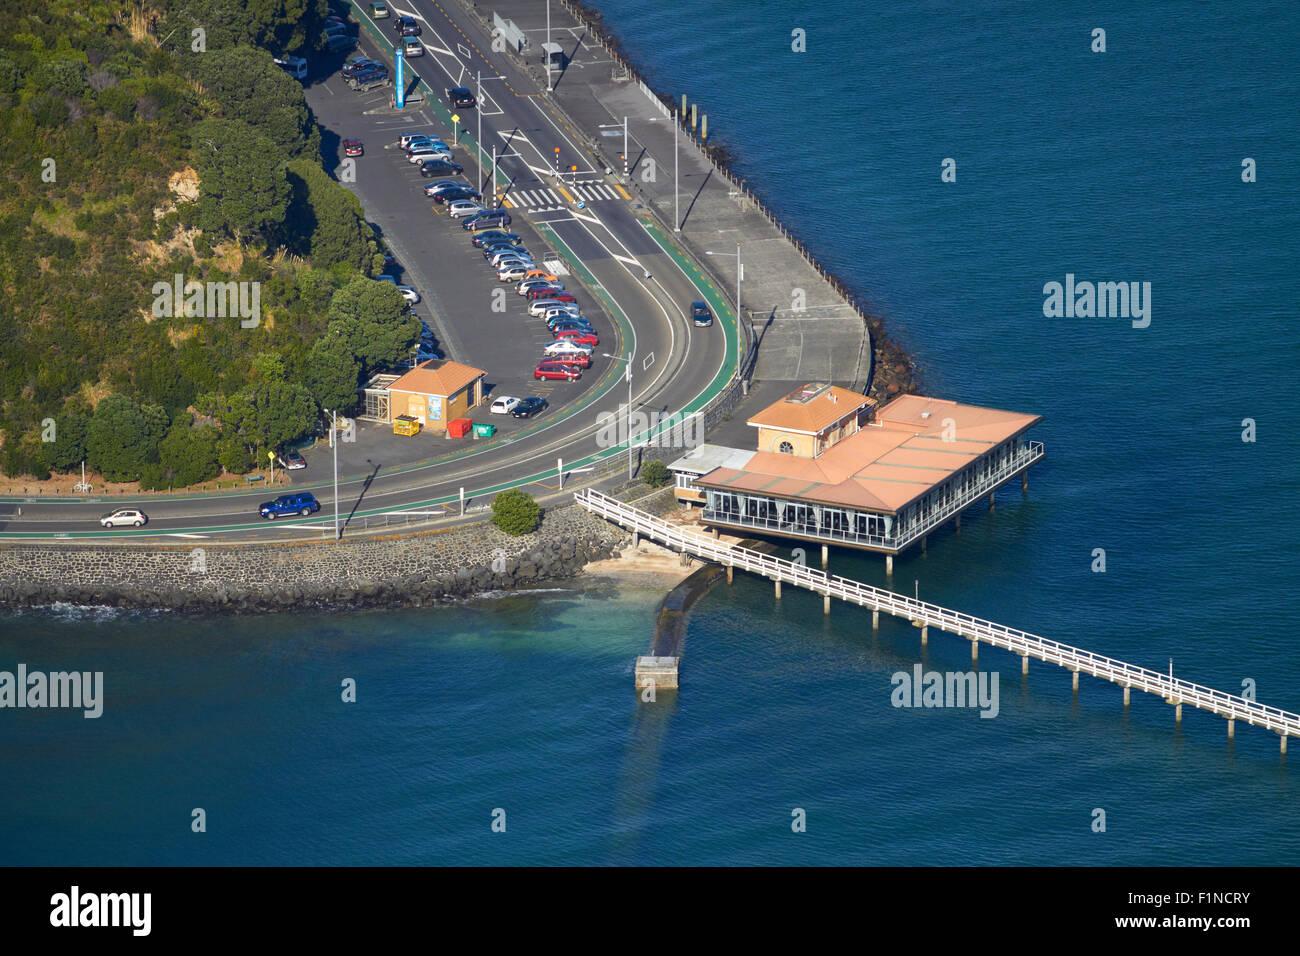 Orakei Wharf, Auckland, North Island, New Zealand - aerial - Stock Image